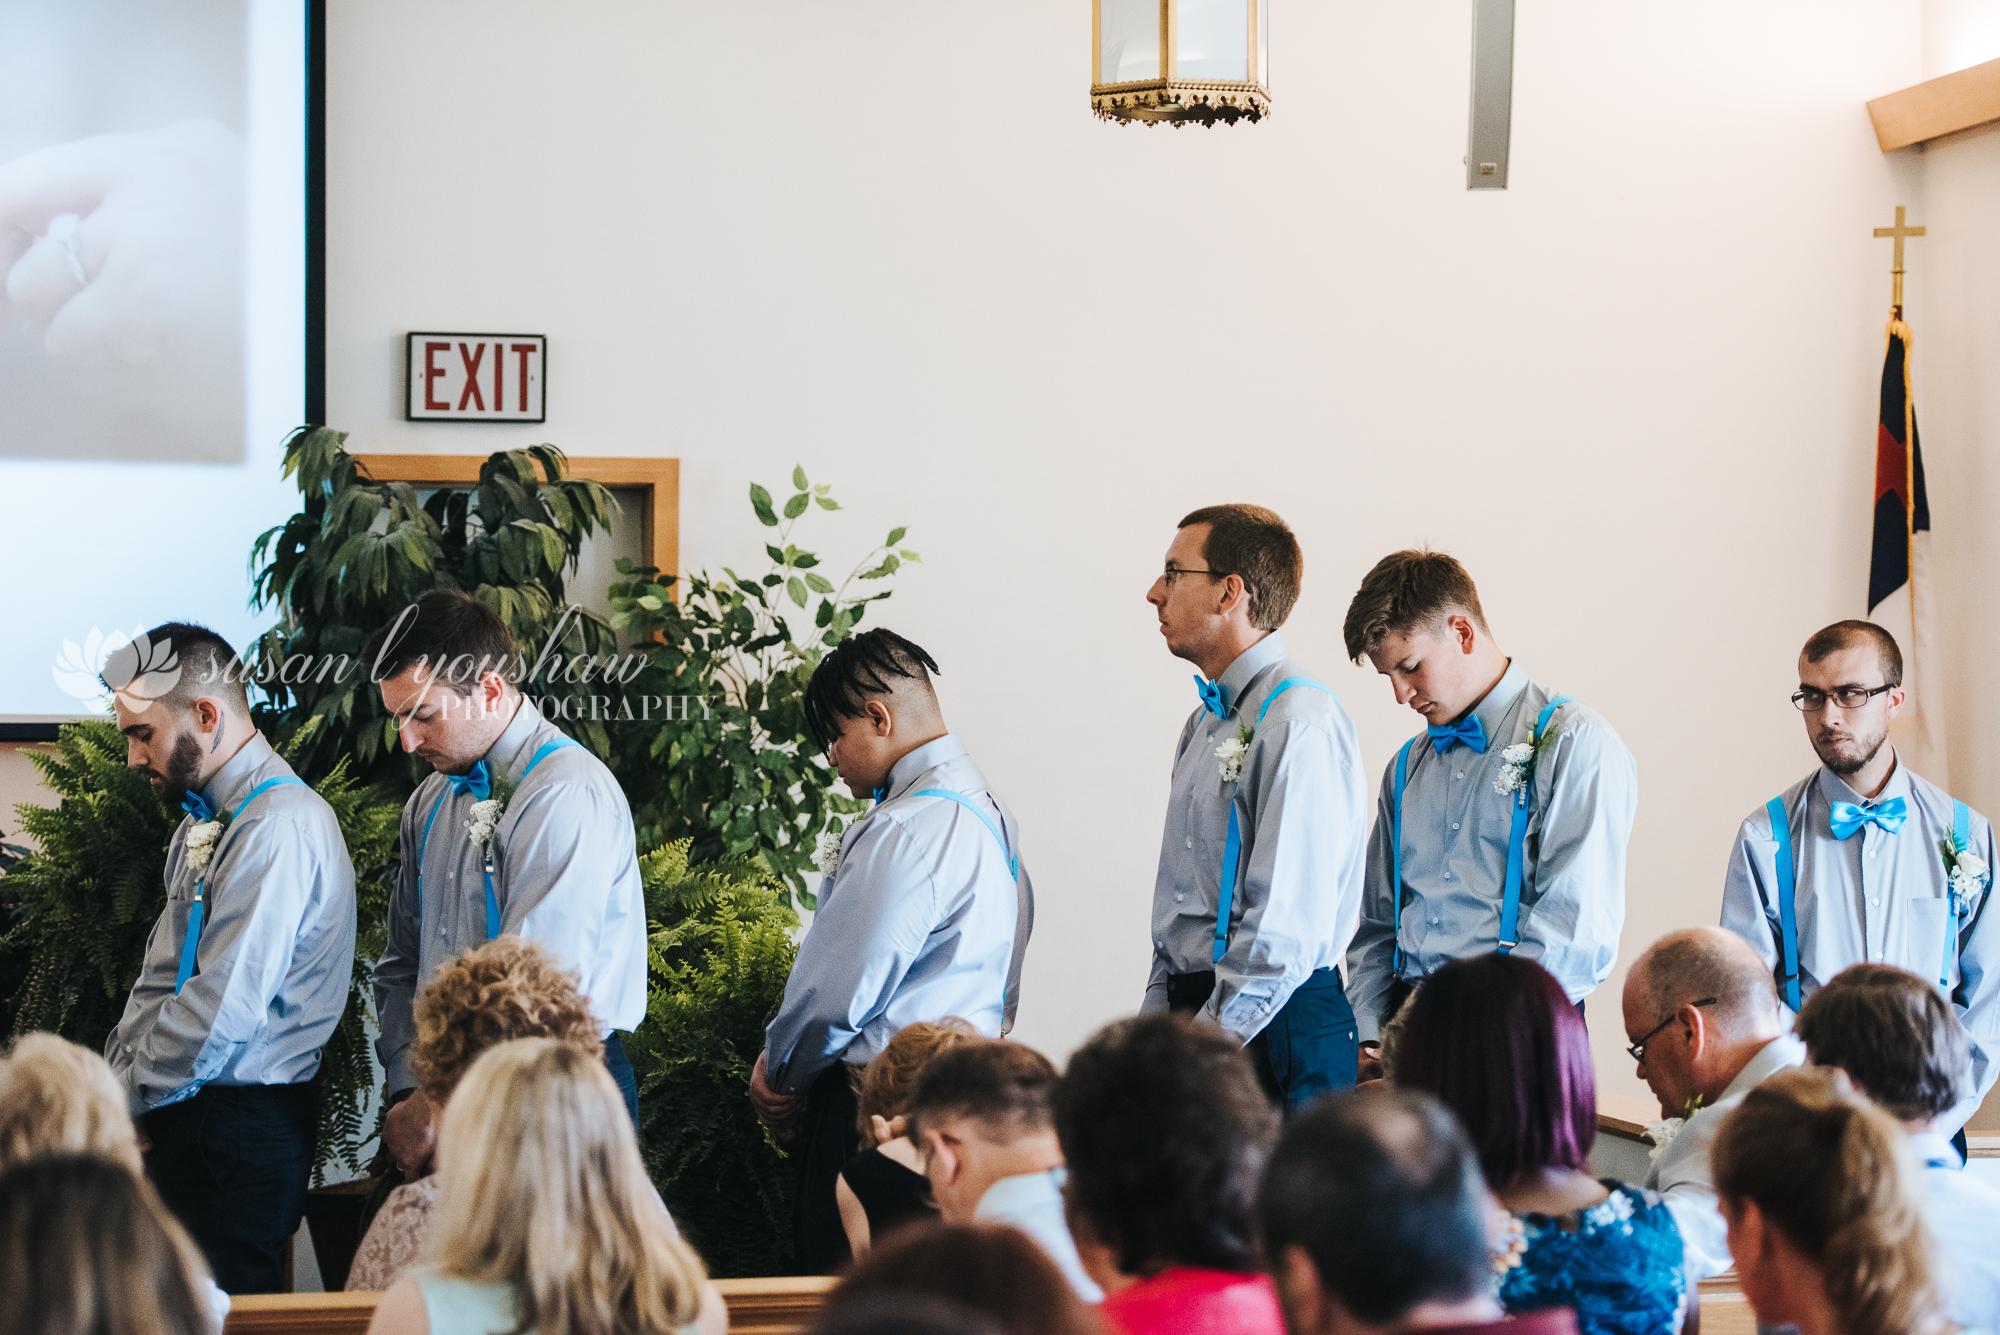 Katelyn and Wes Wedding Photos 07-13-2019 SLY Photography-64.jpg